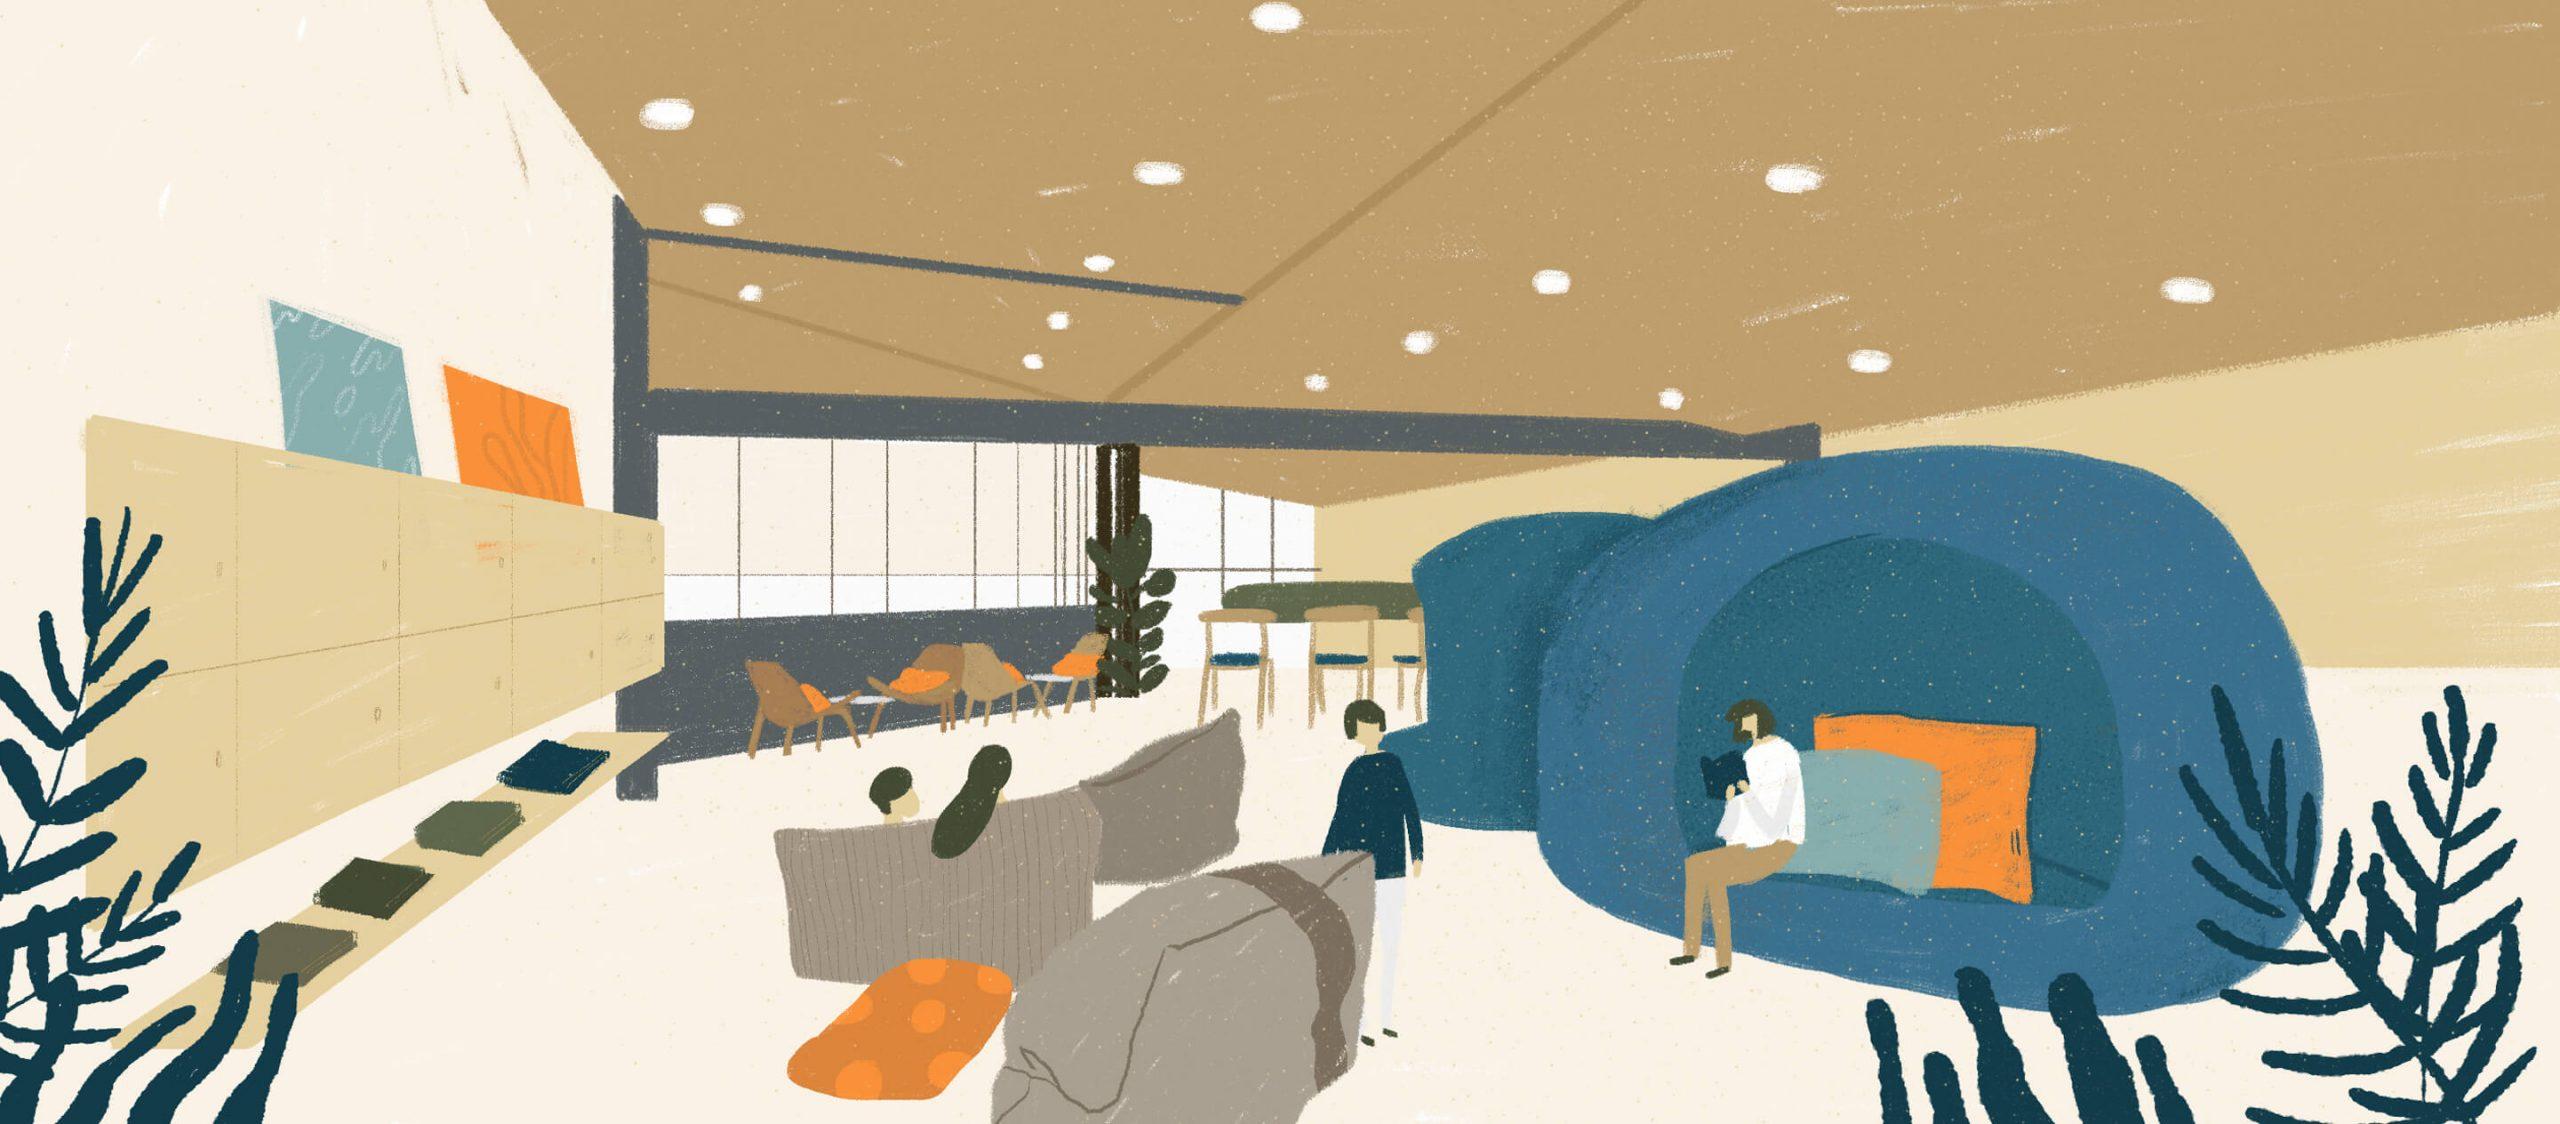 TRIPLE Y RESIDENCE ที่พักรูปแบบใหม่ที่ครบครันในโครงการสามย่านมิตรทาวน์